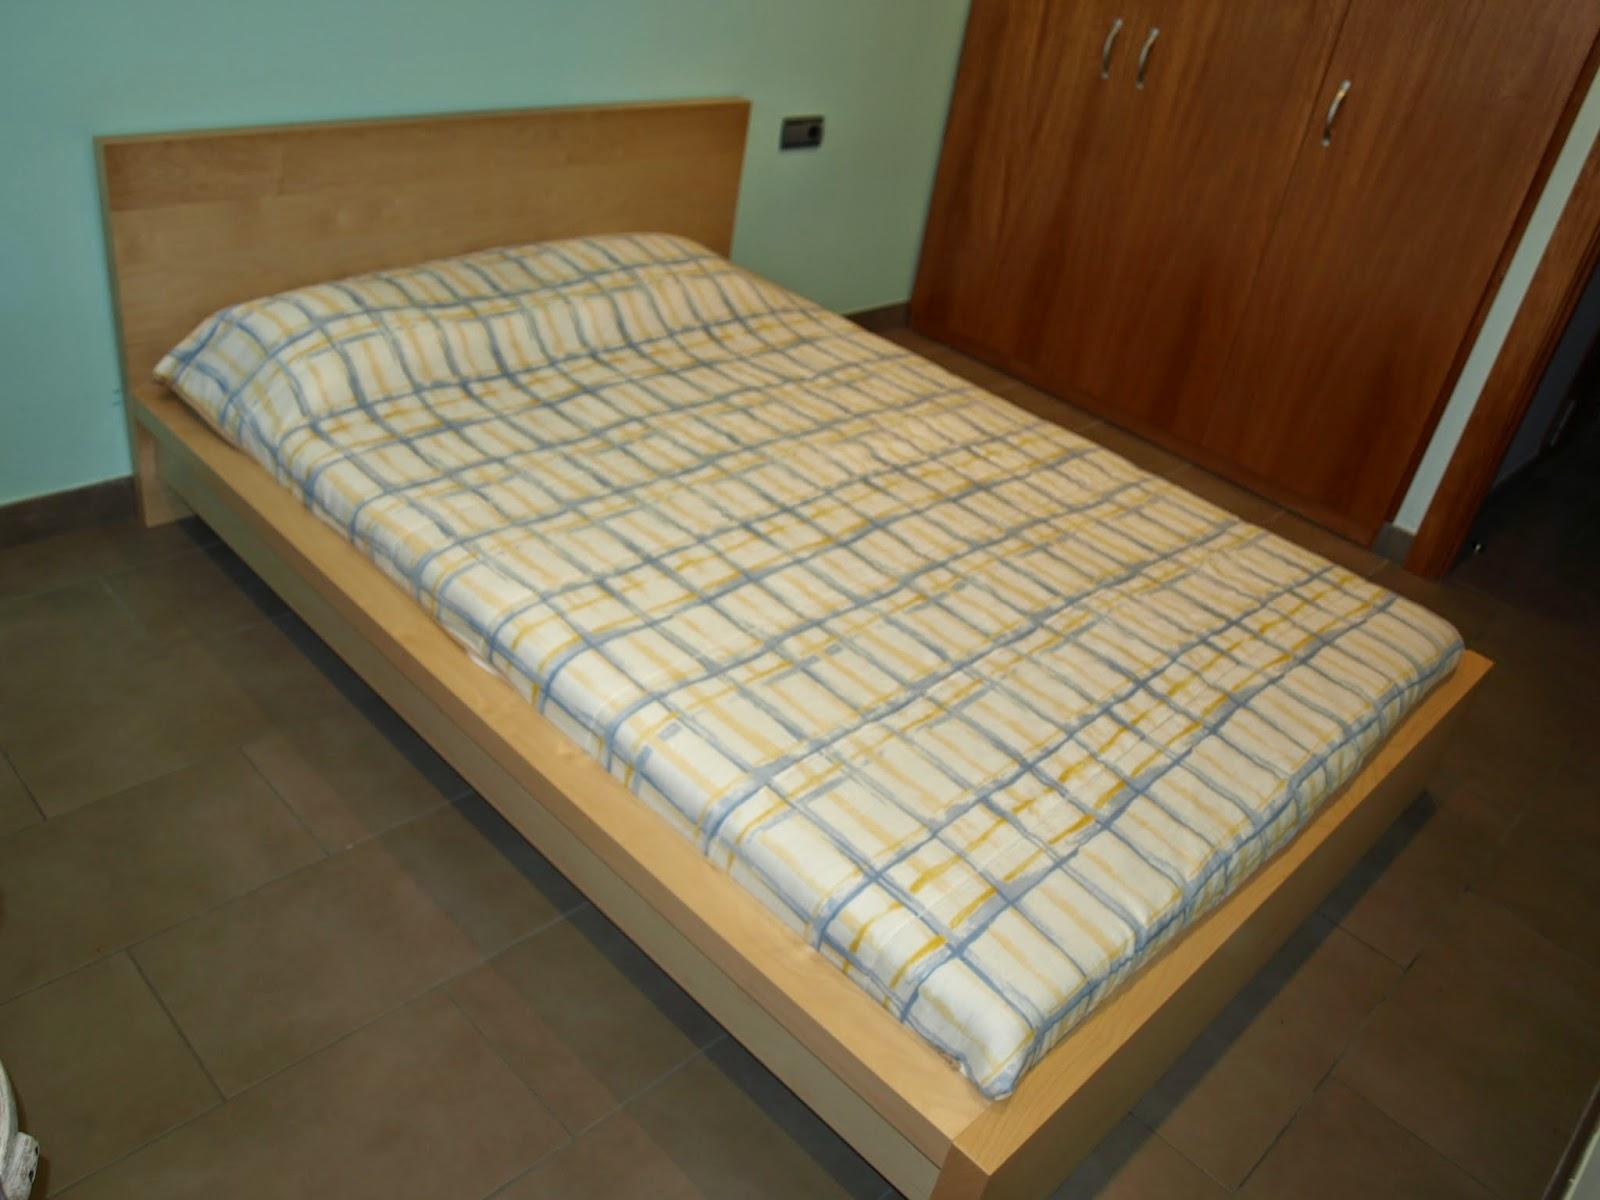 Colchones de matrimonio affordable cama colchn protector - Cama doble ikea ...